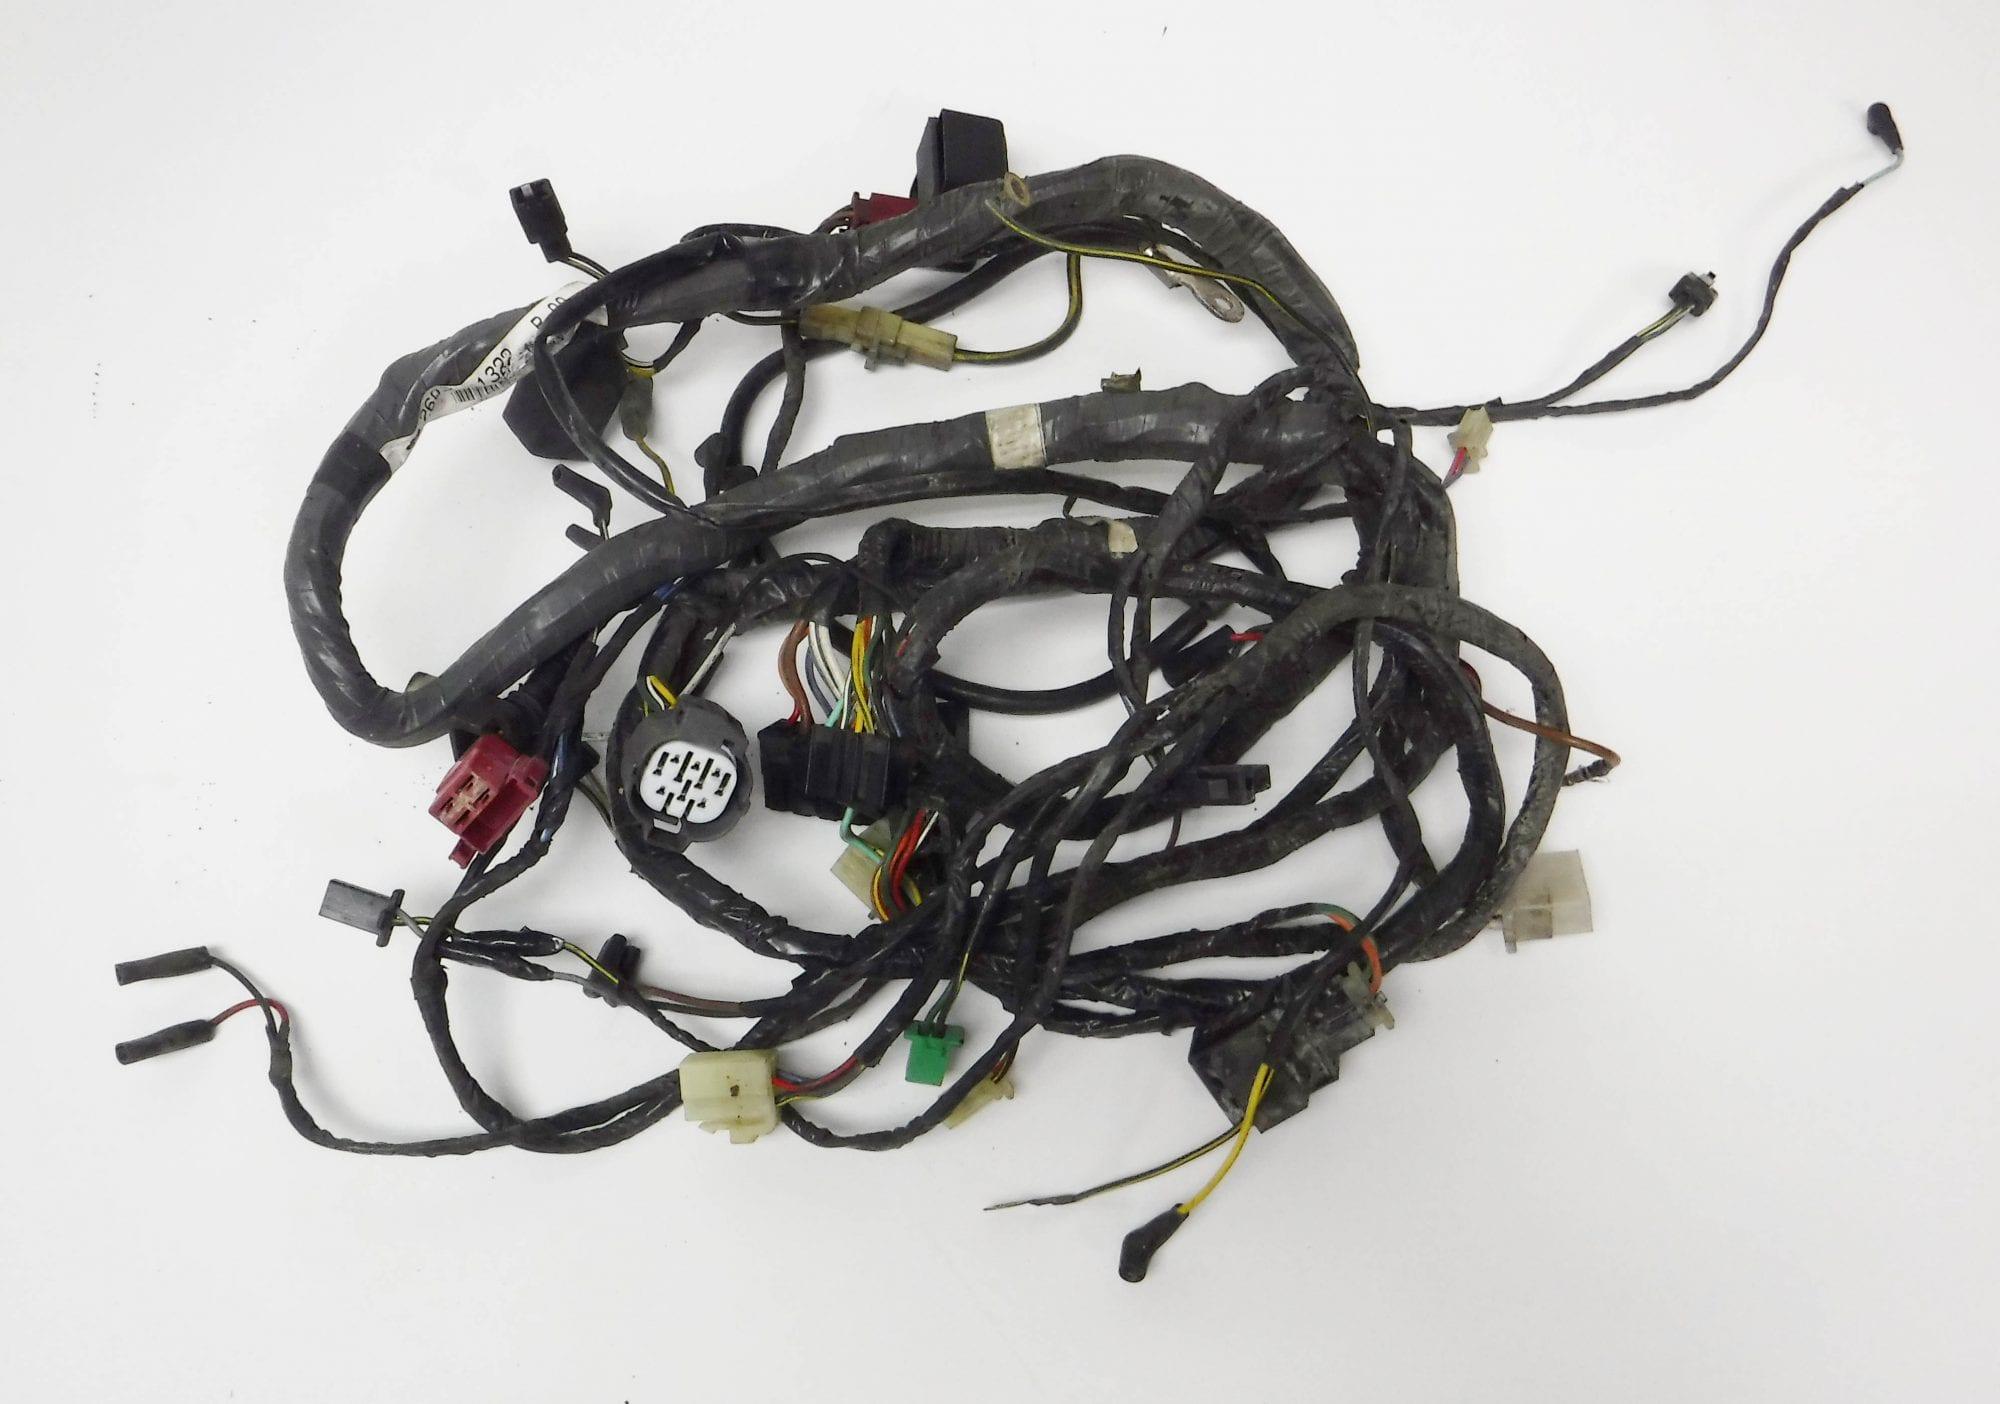 hight resolution of wiring harness kawasaki zx 11 zx11 95 01 26030 1322